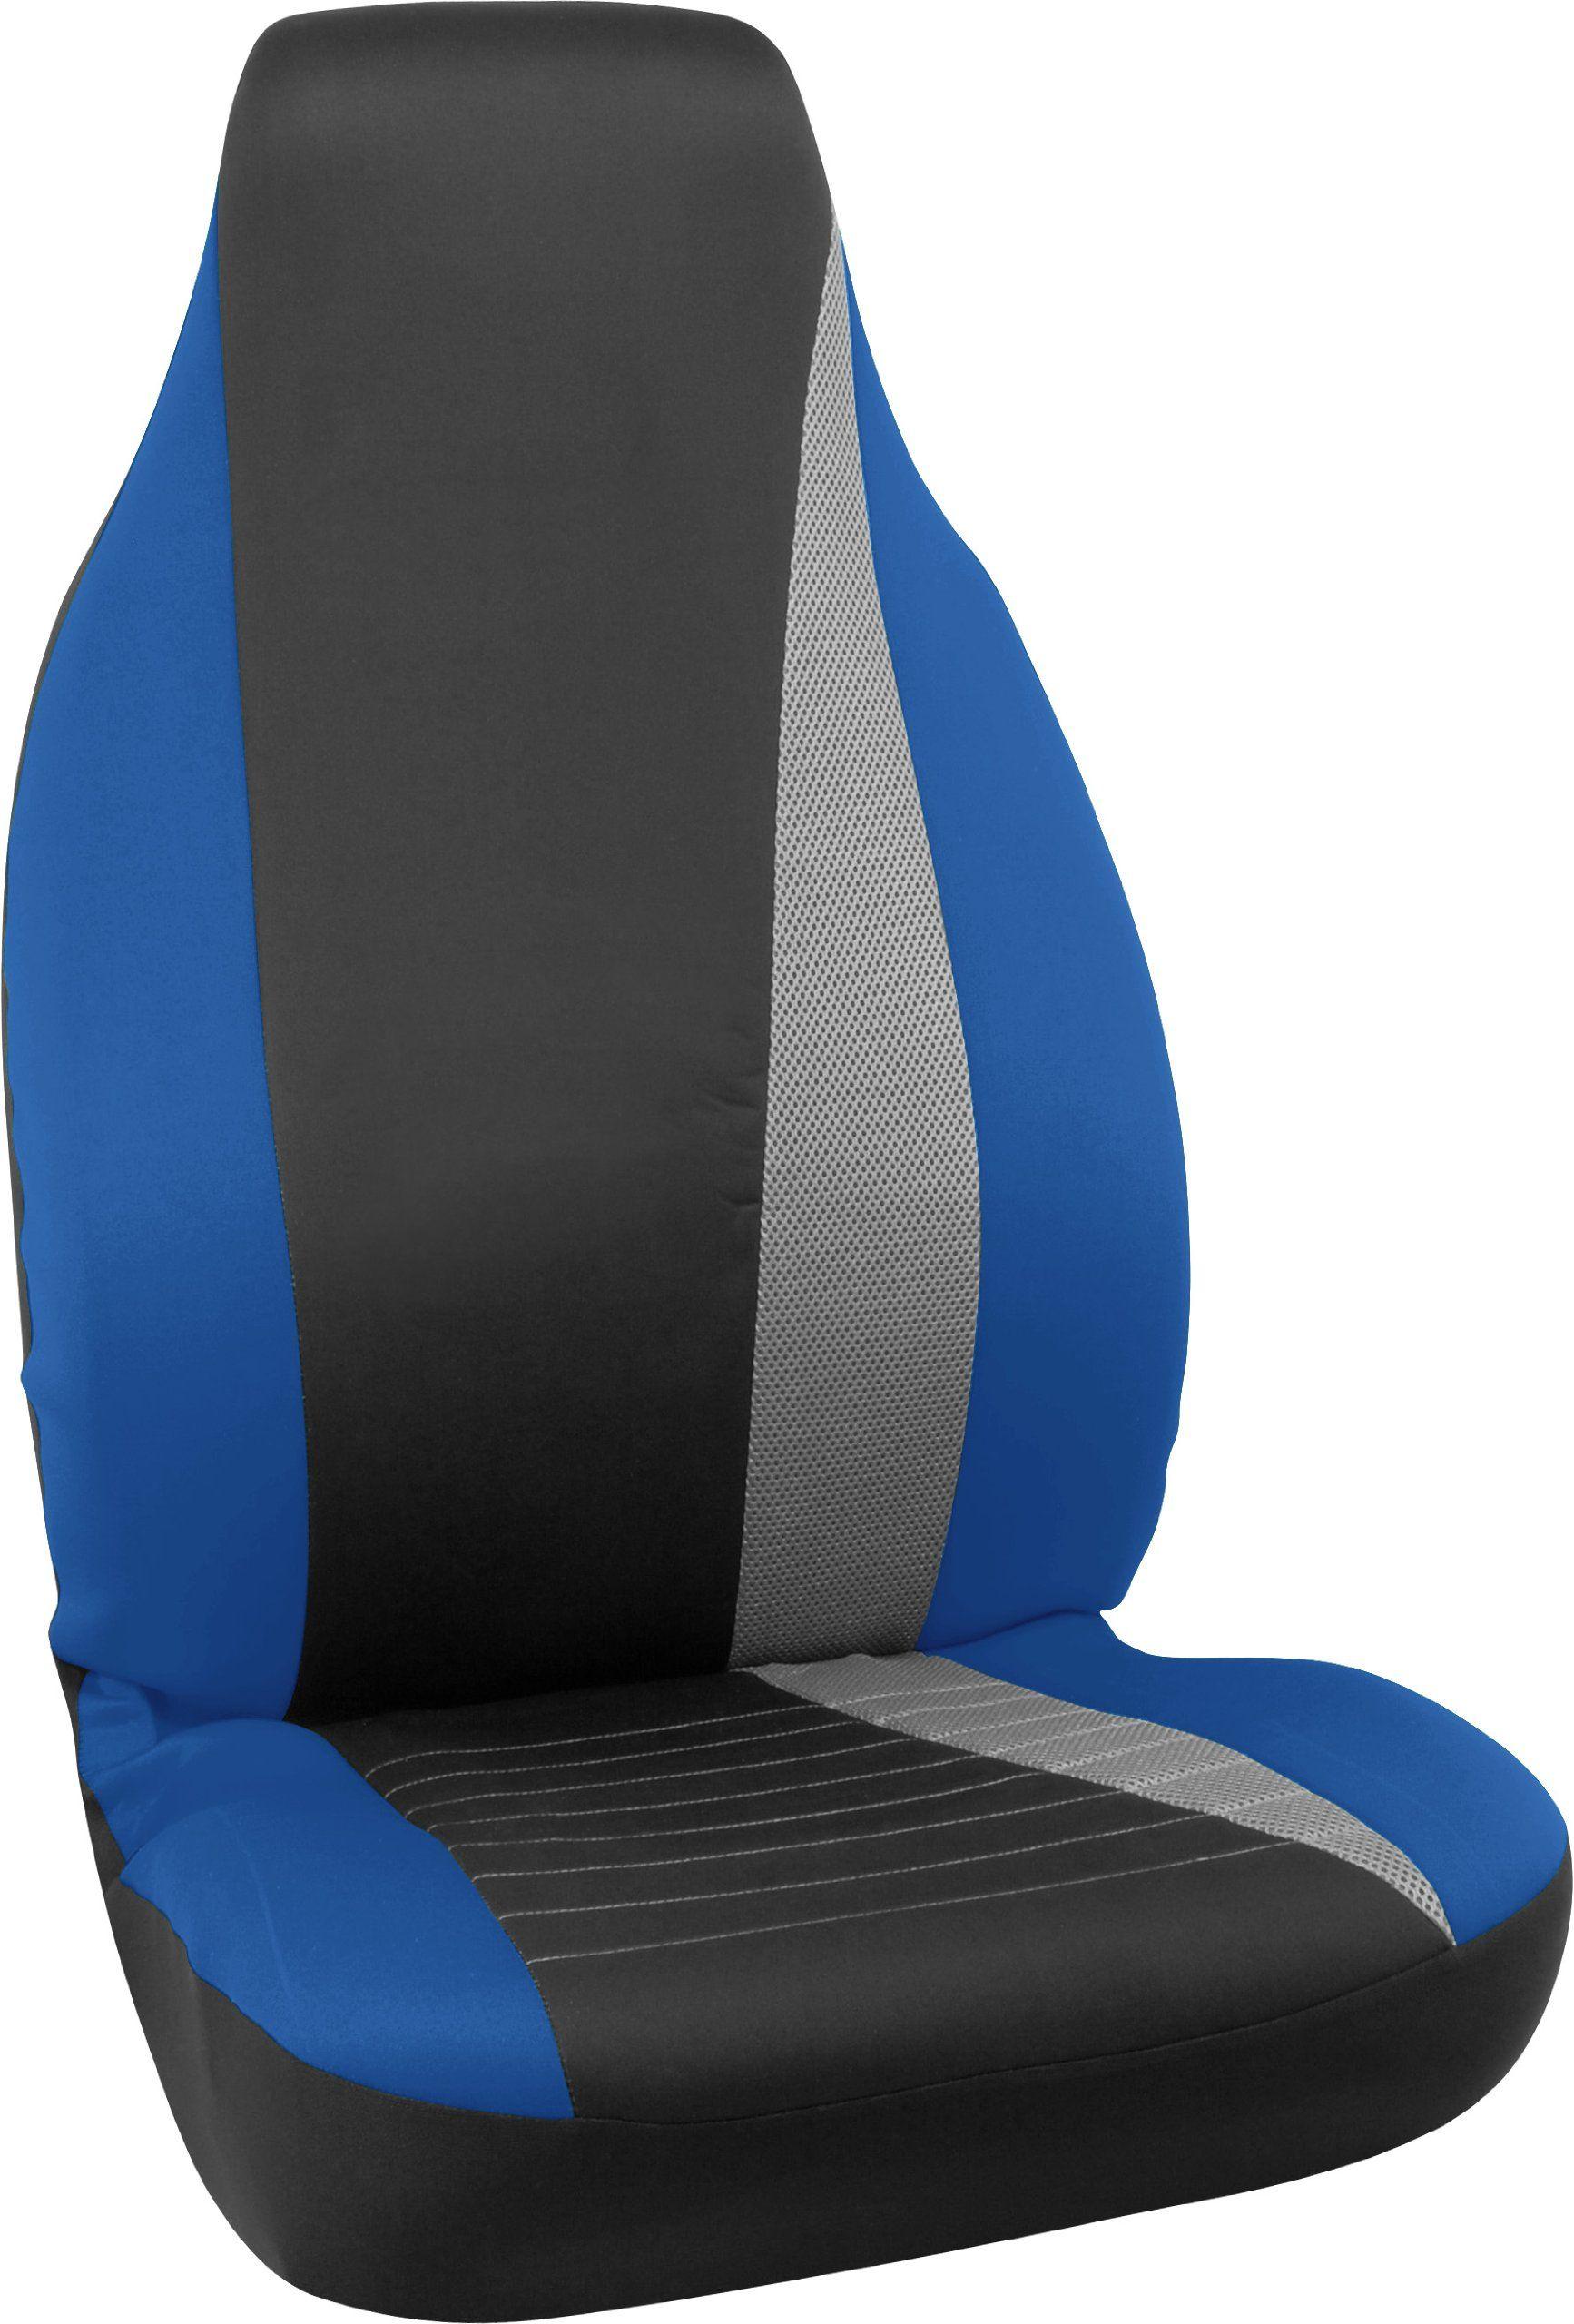 Bell Automotive 221568549 Blue Neoprene Universal